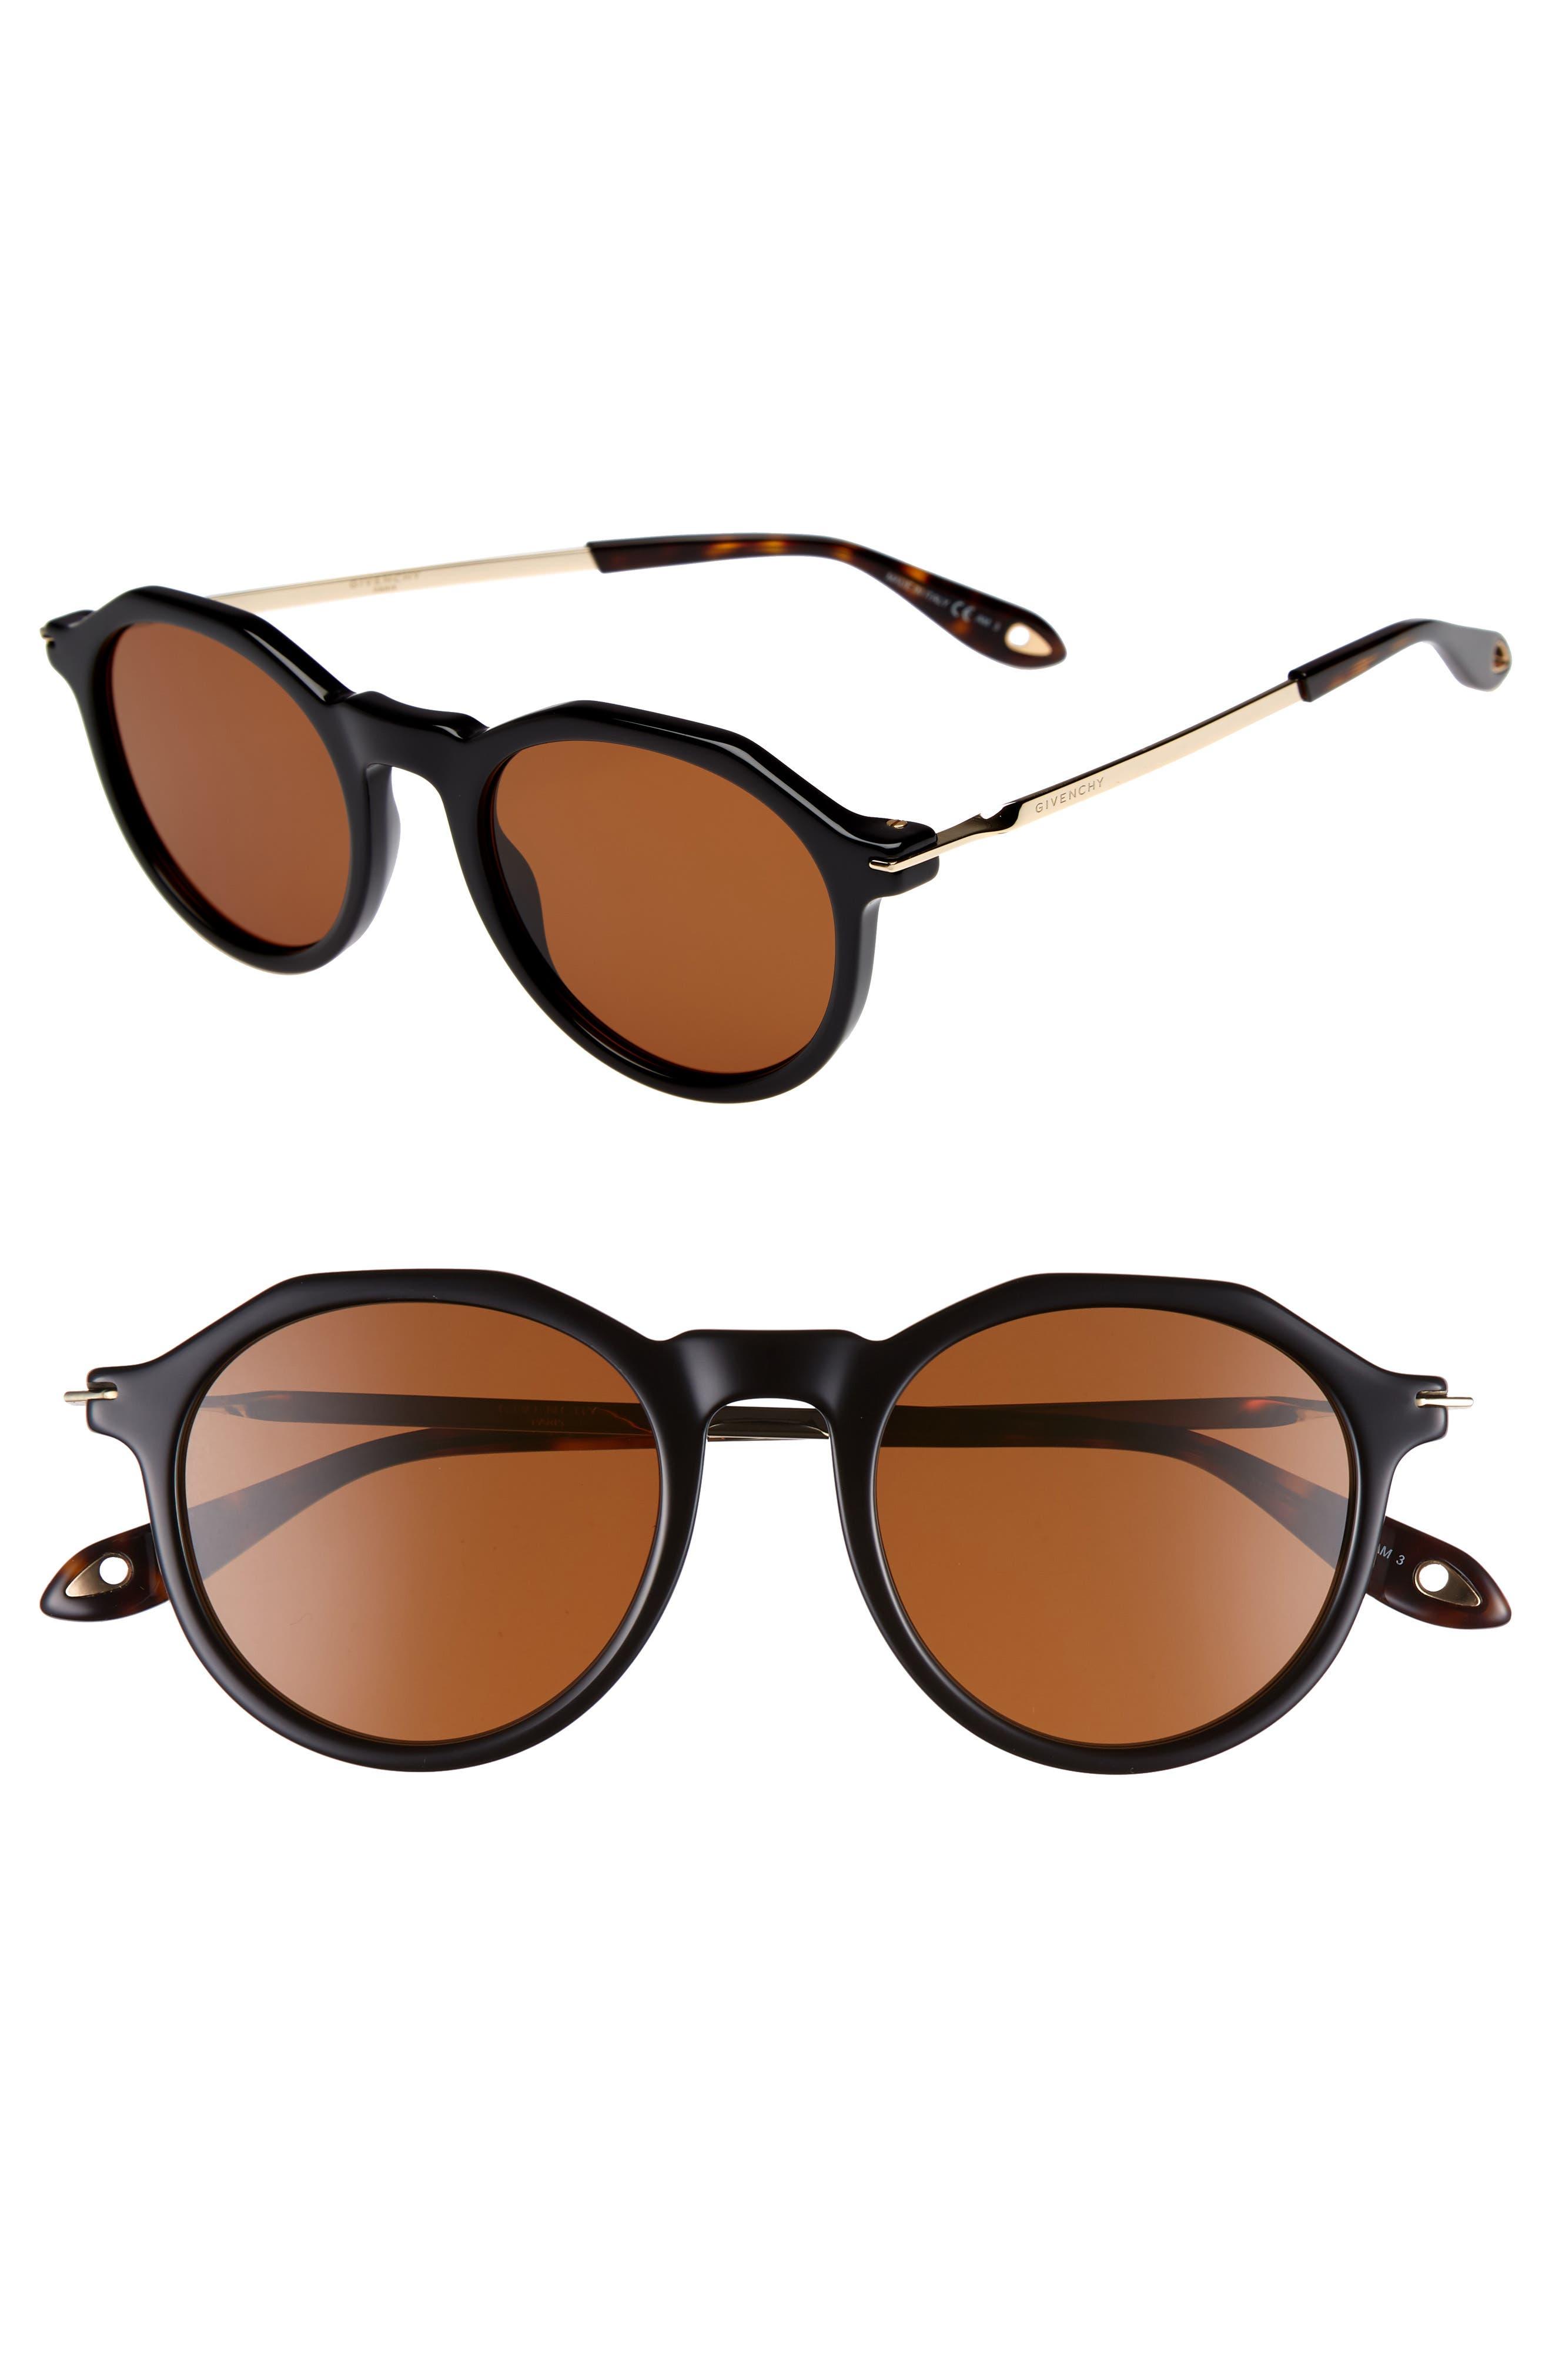 51mm Round Sunglasses,                             Main thumbnail 1, color,